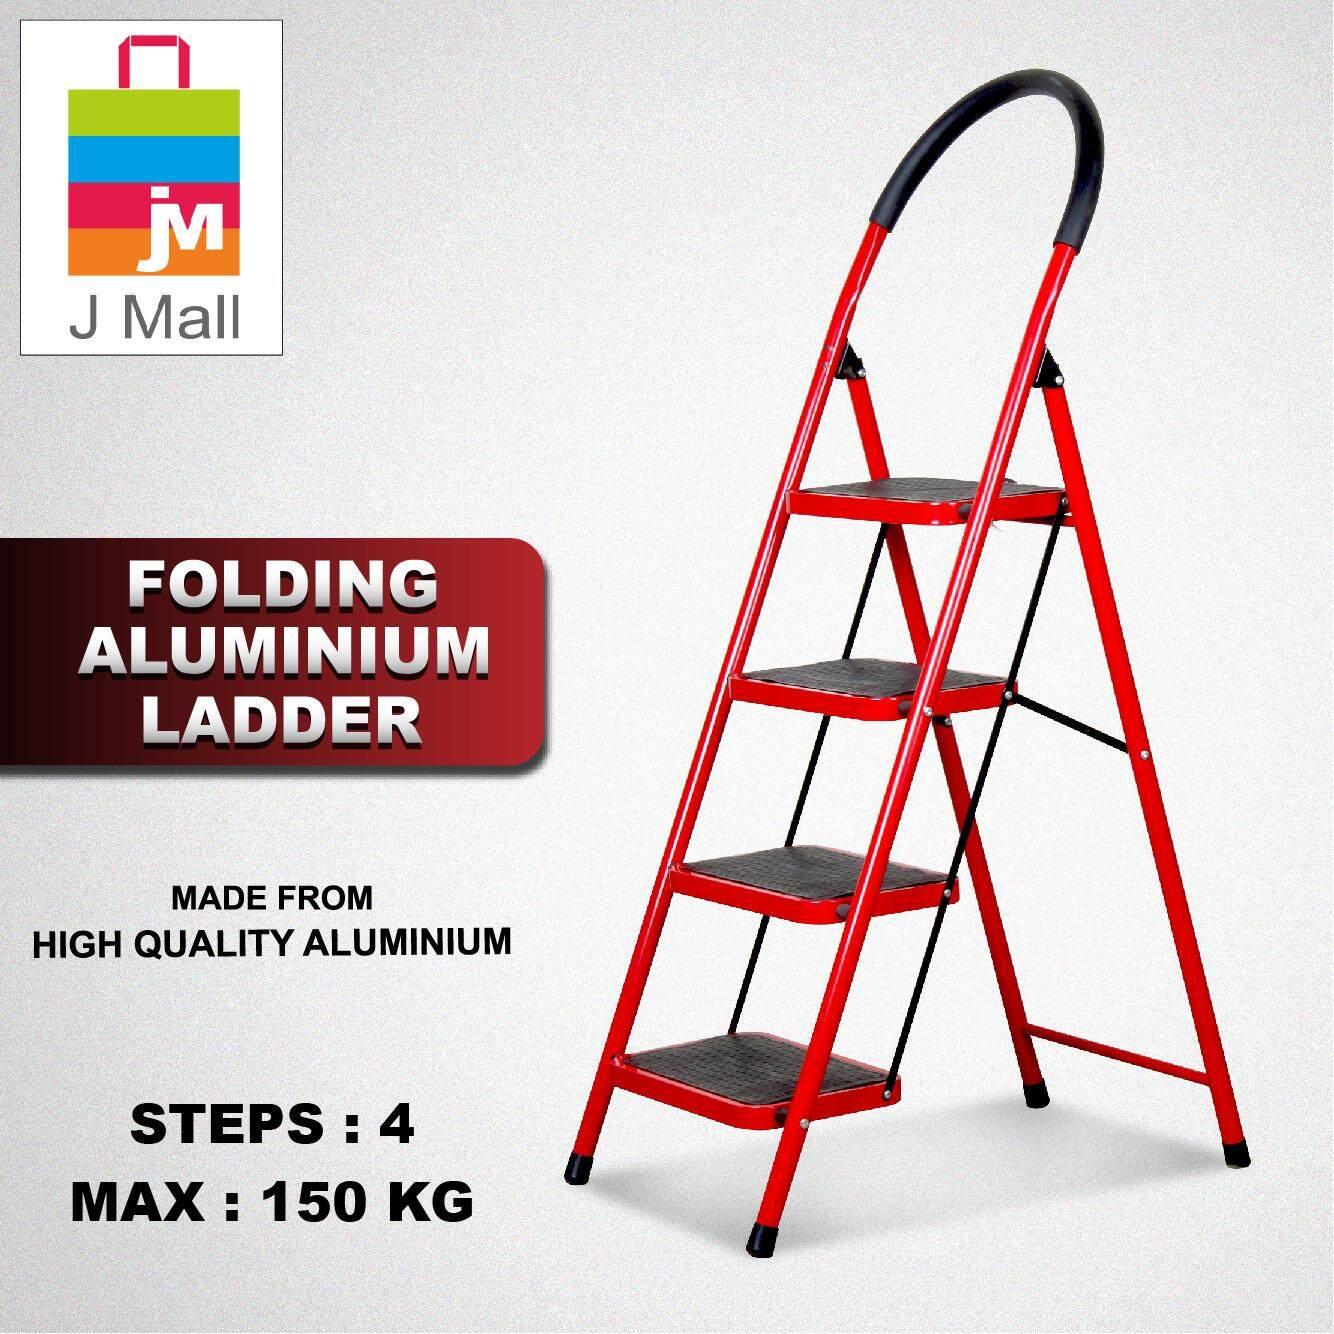 JMALL NON SLIP FOLDING L/WEIGHT LADDER (4 WIDE STEPS)